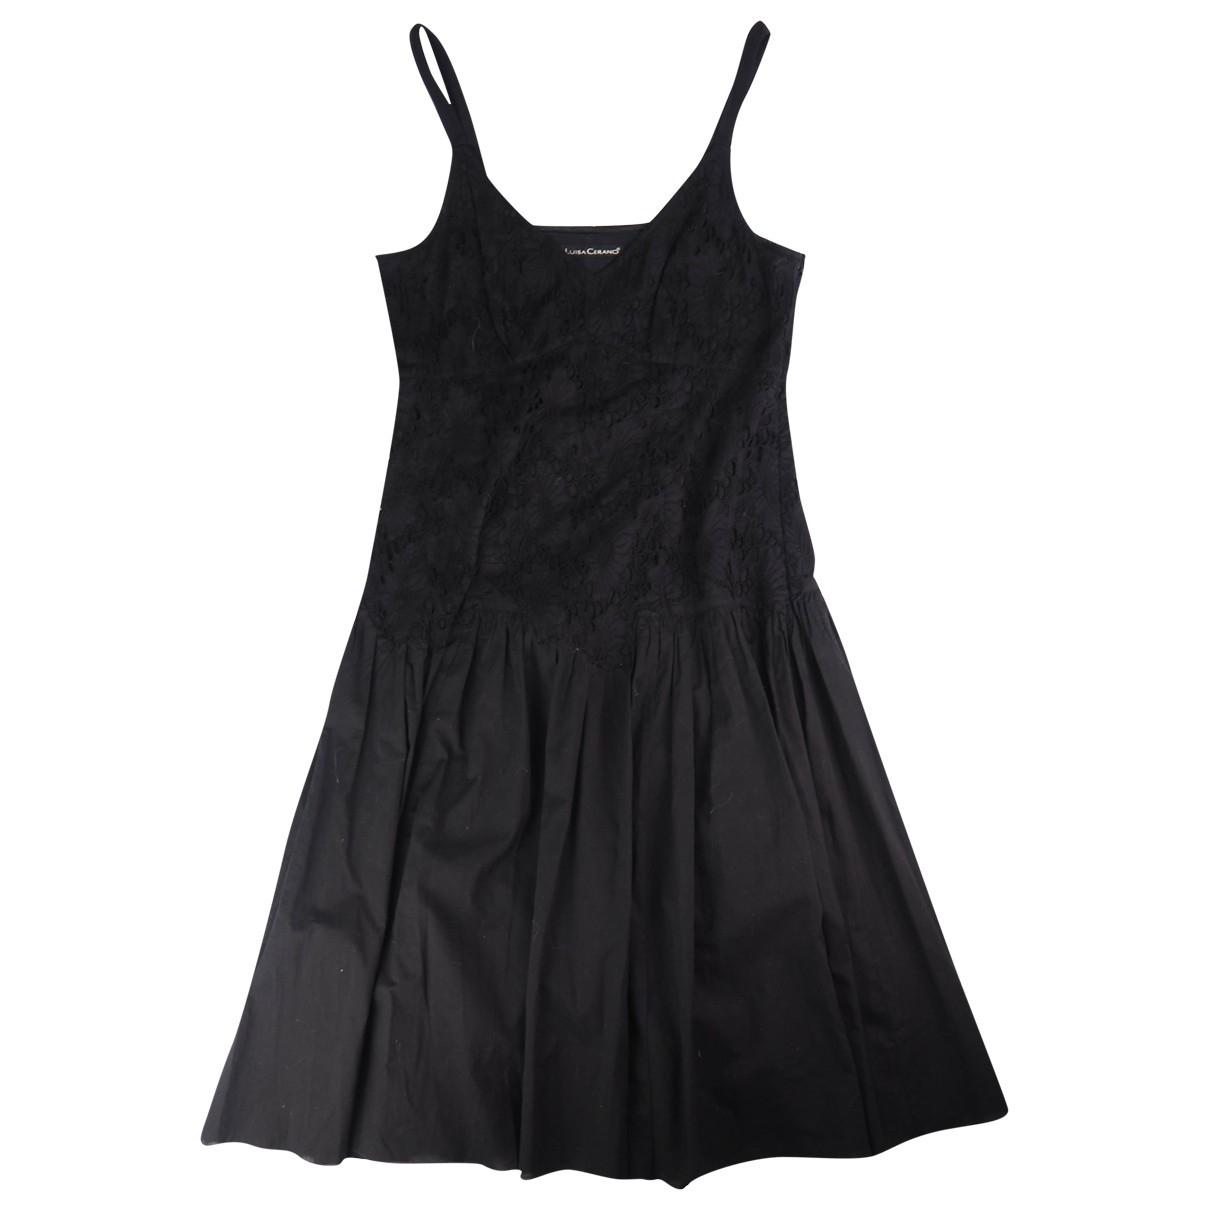 Luisa Cerano \N Kleid in  Schwarz Baumwolle